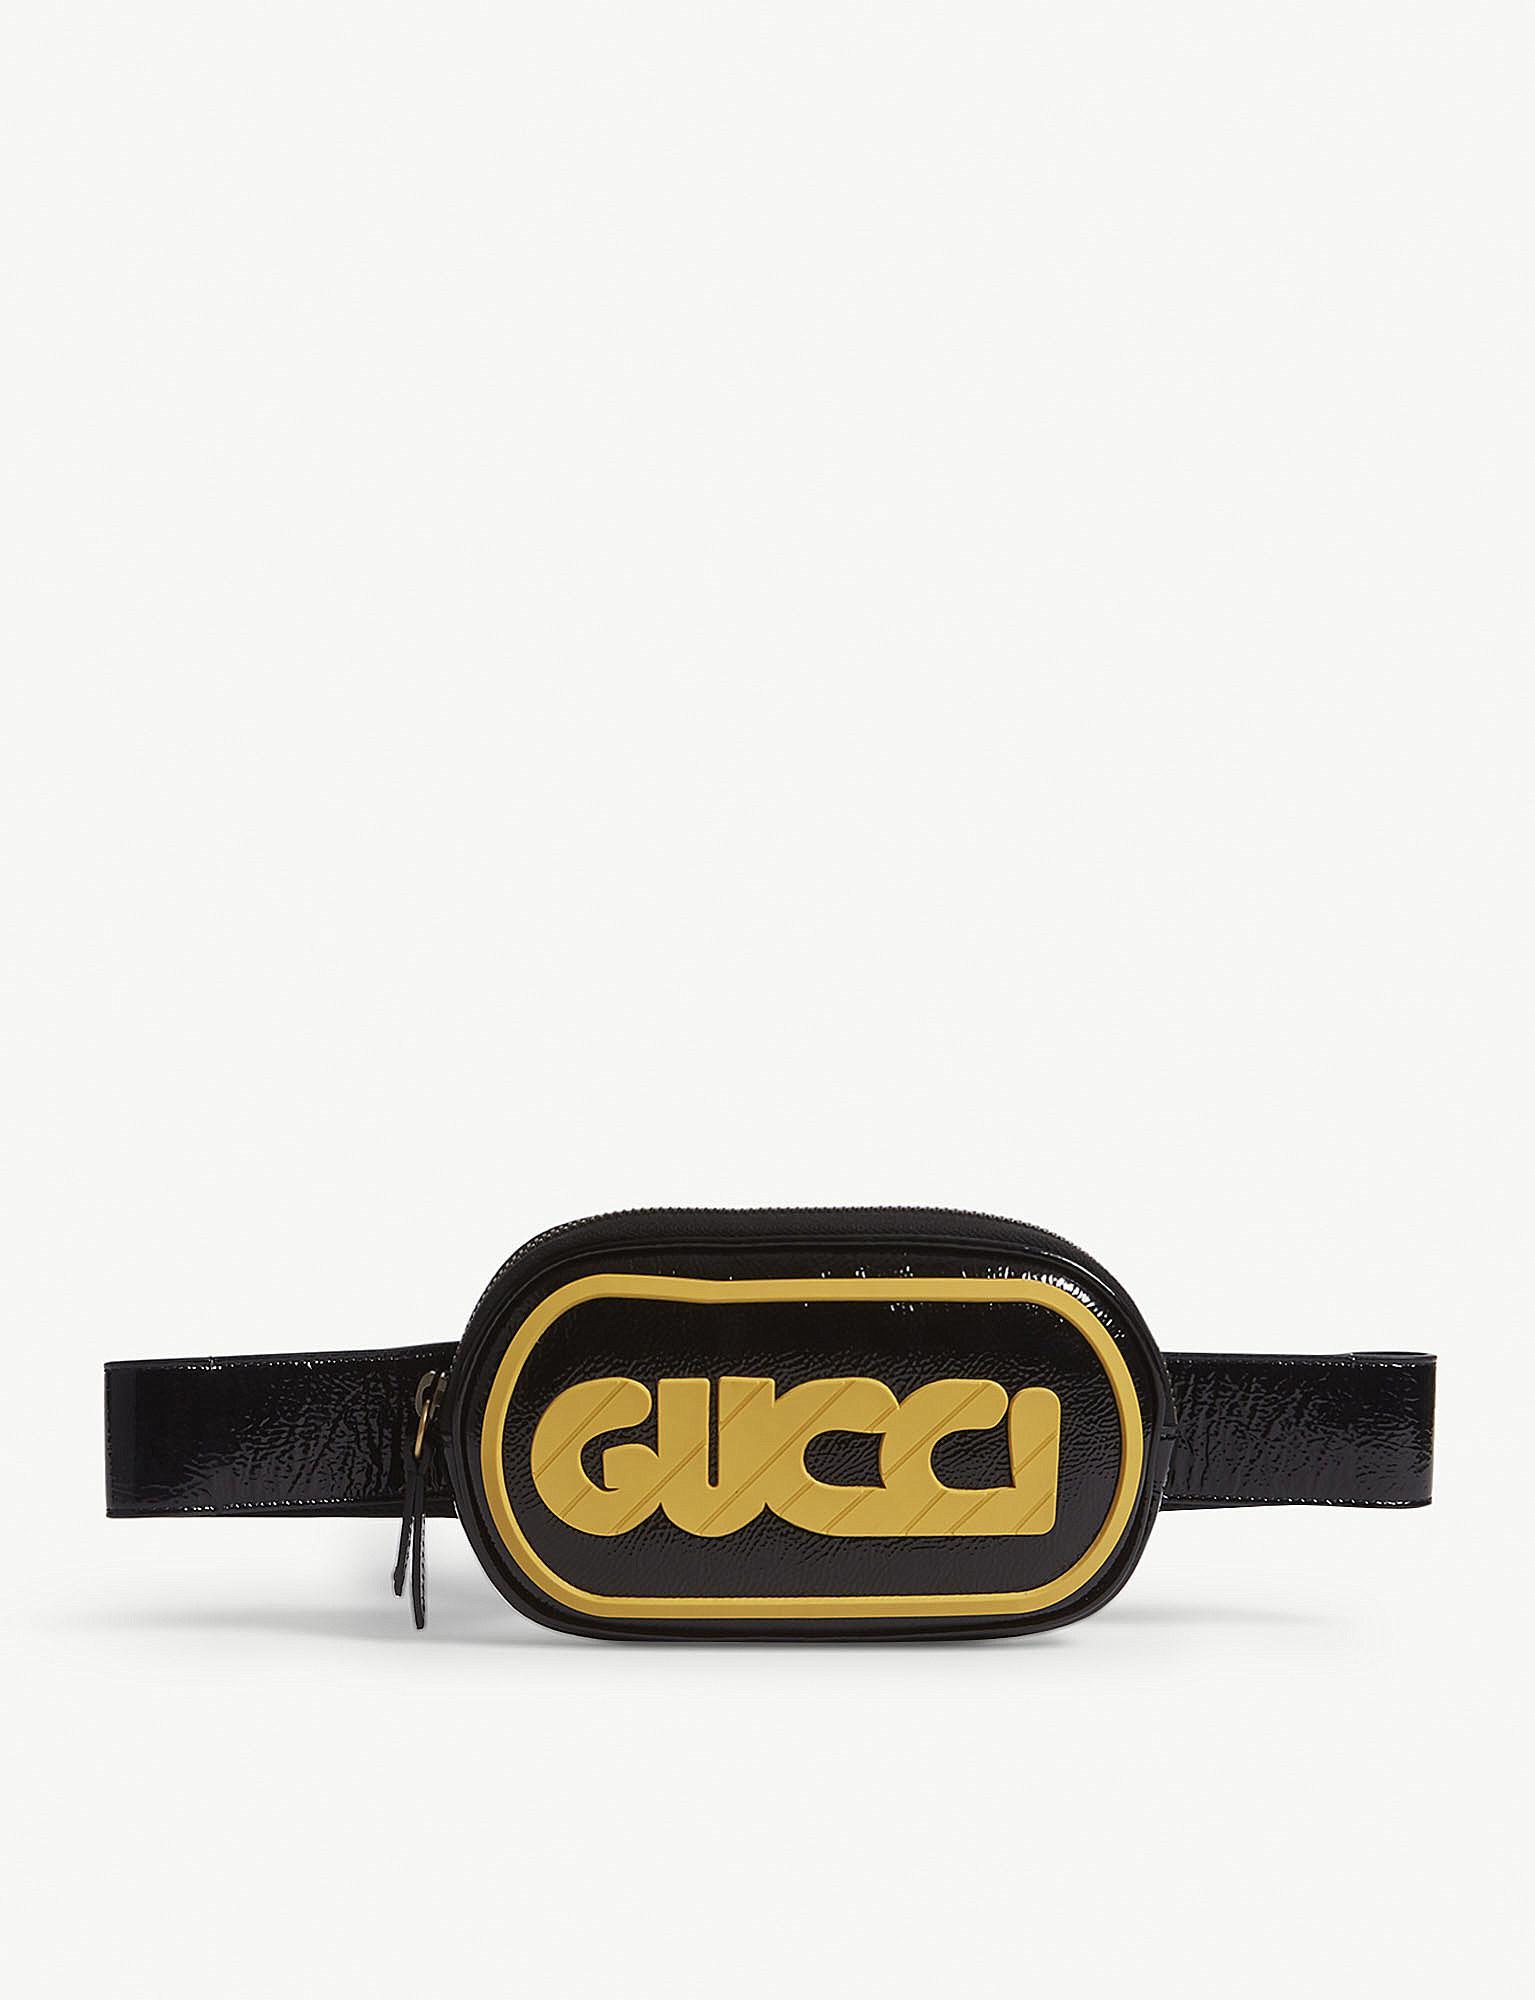 48c0889a383 Lyst - Gucci Striped Logo Patent Leather Belt Bag in Black